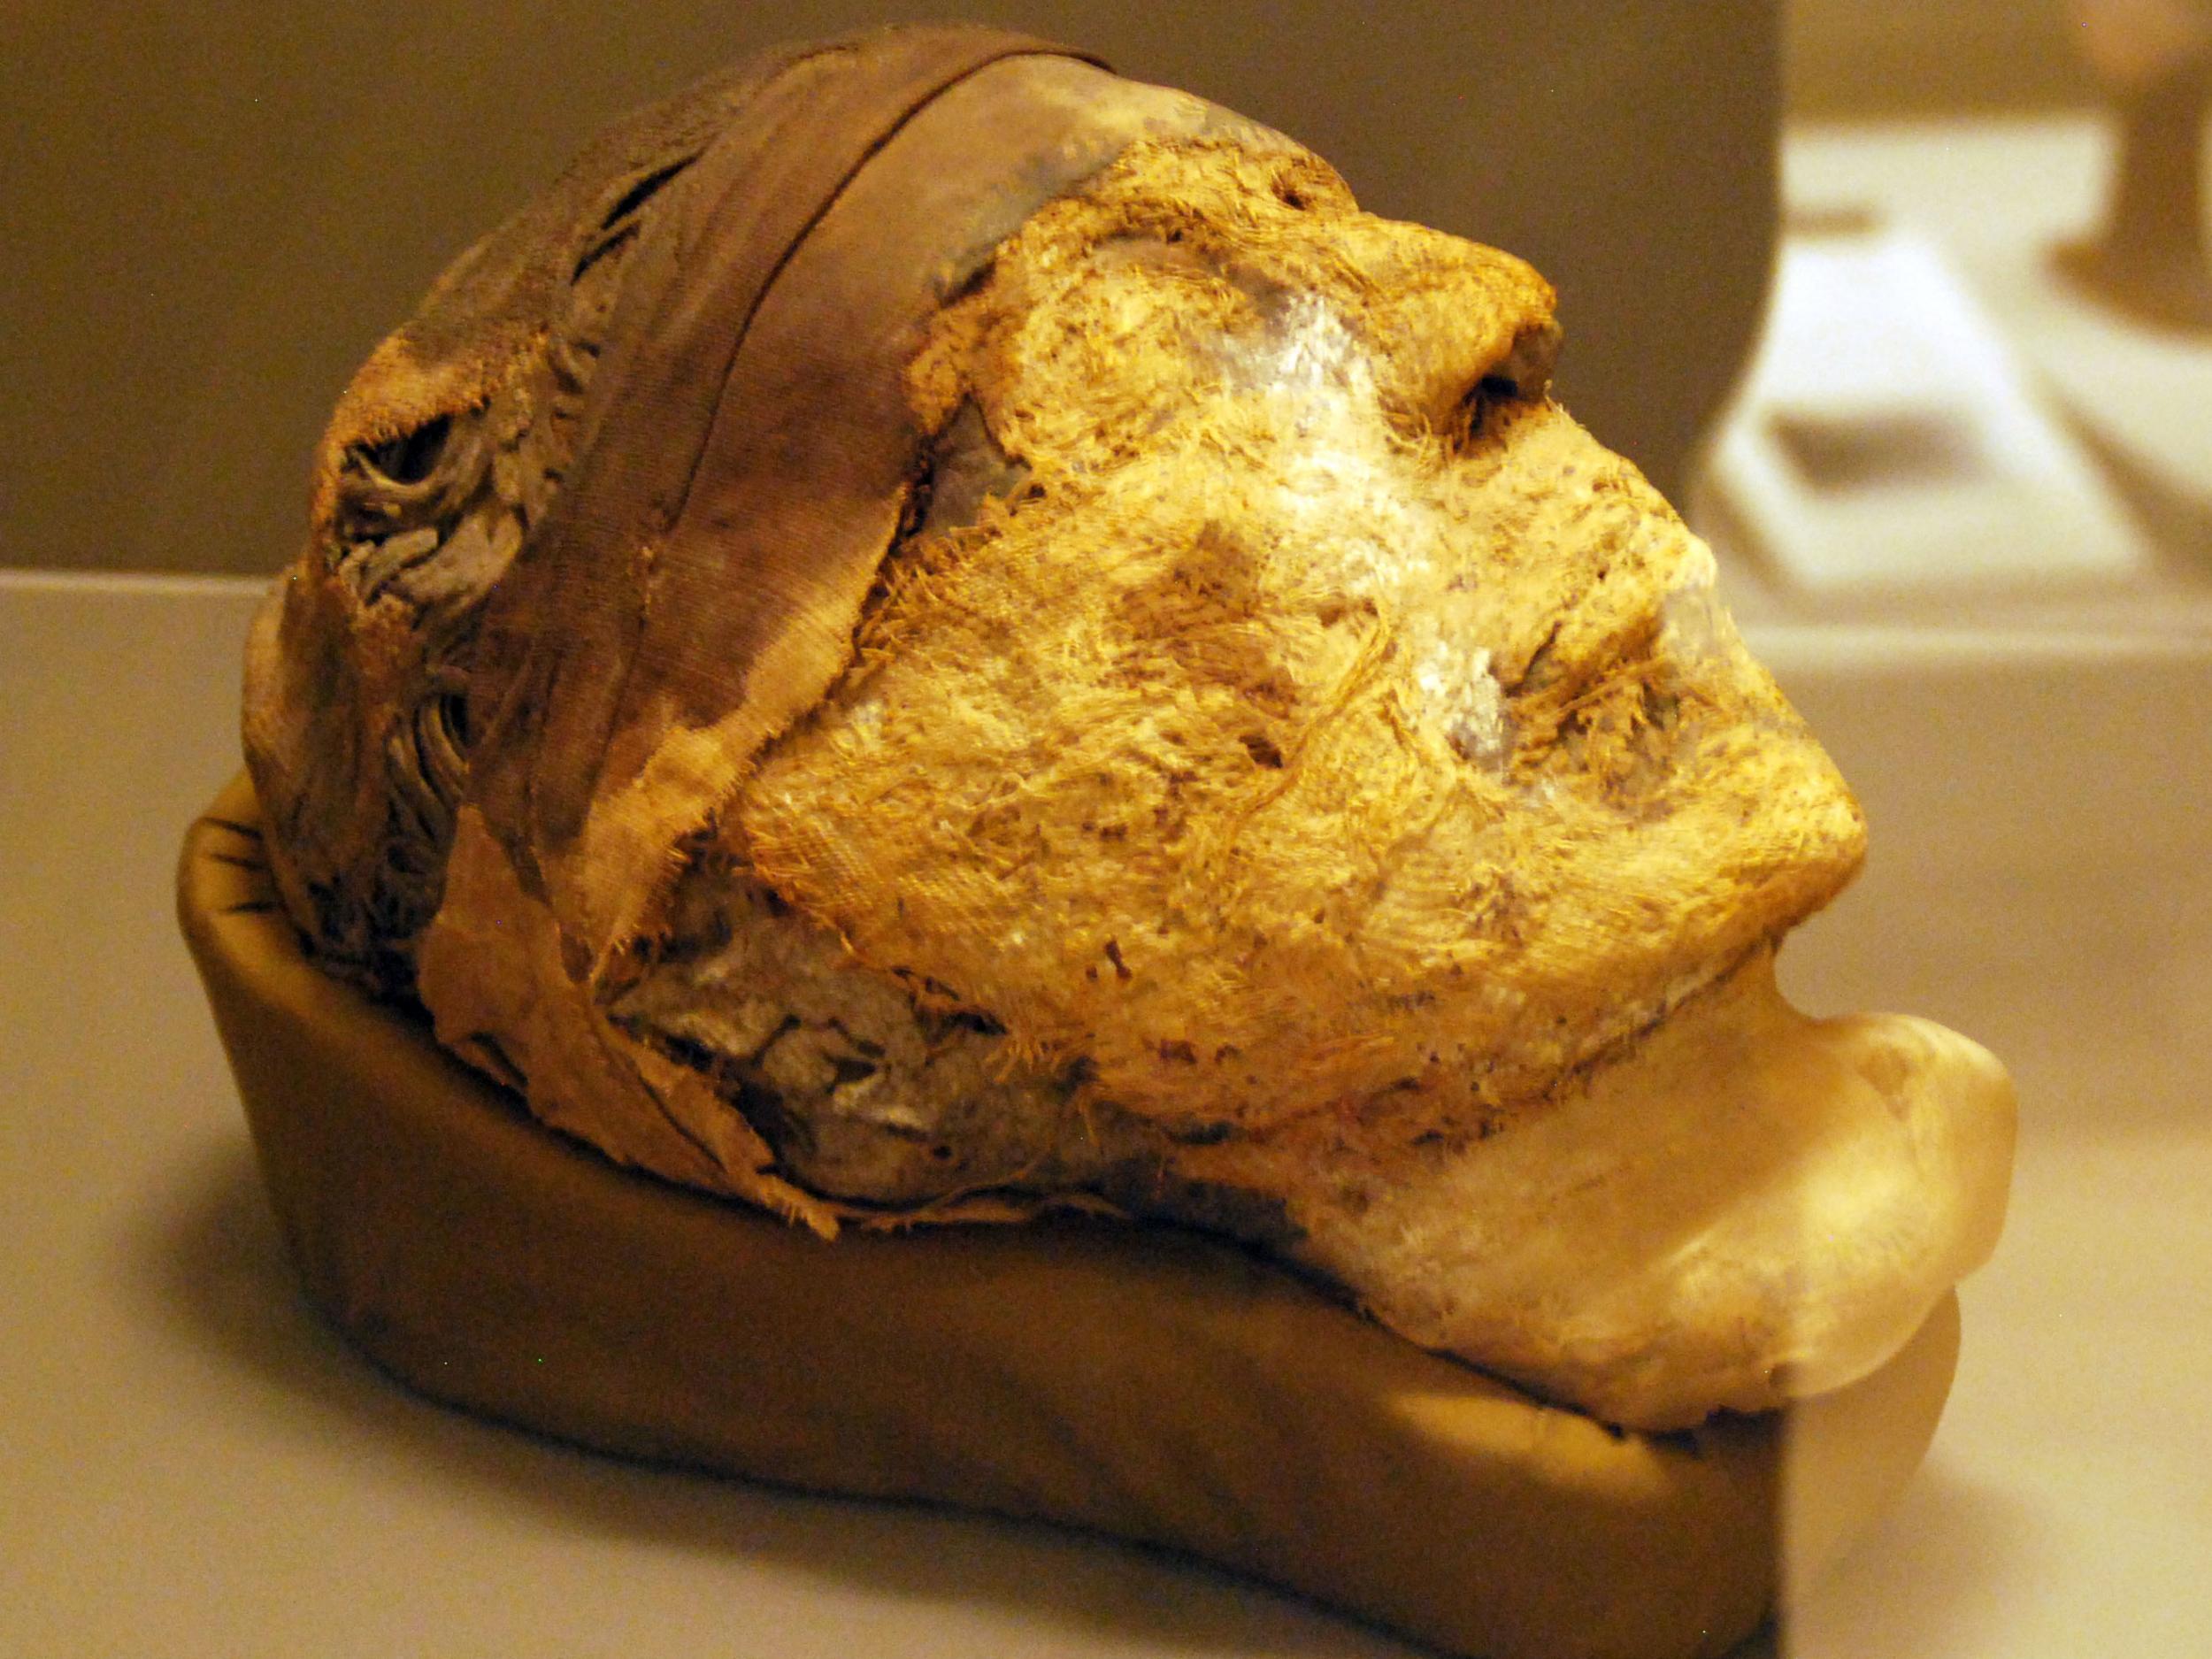 Tomb secrets: The FBI cracks the DNA code on an ancient Egyptian mummy